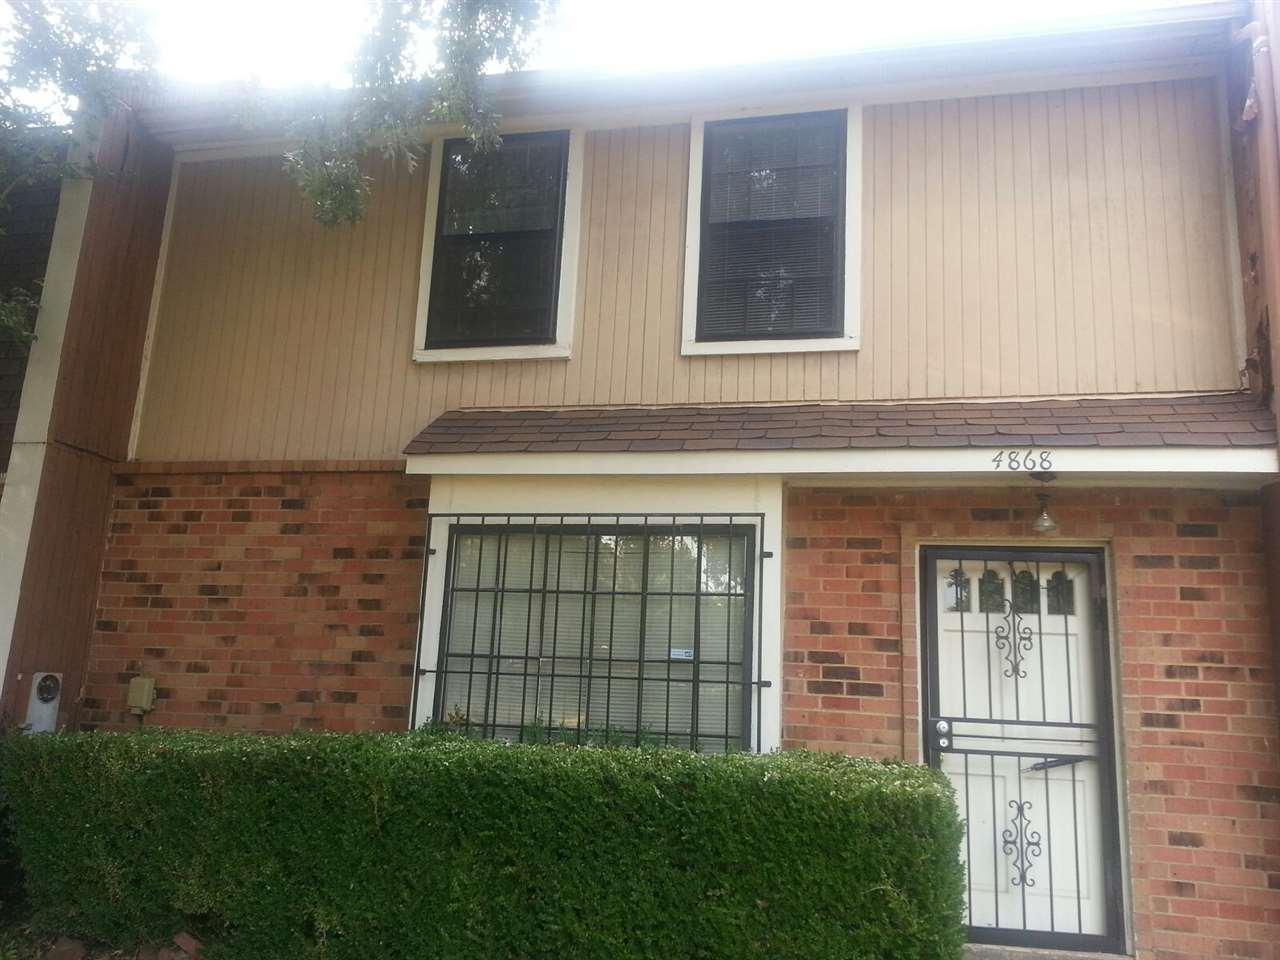 4868 Chesterwood, Memphis, TN 38118